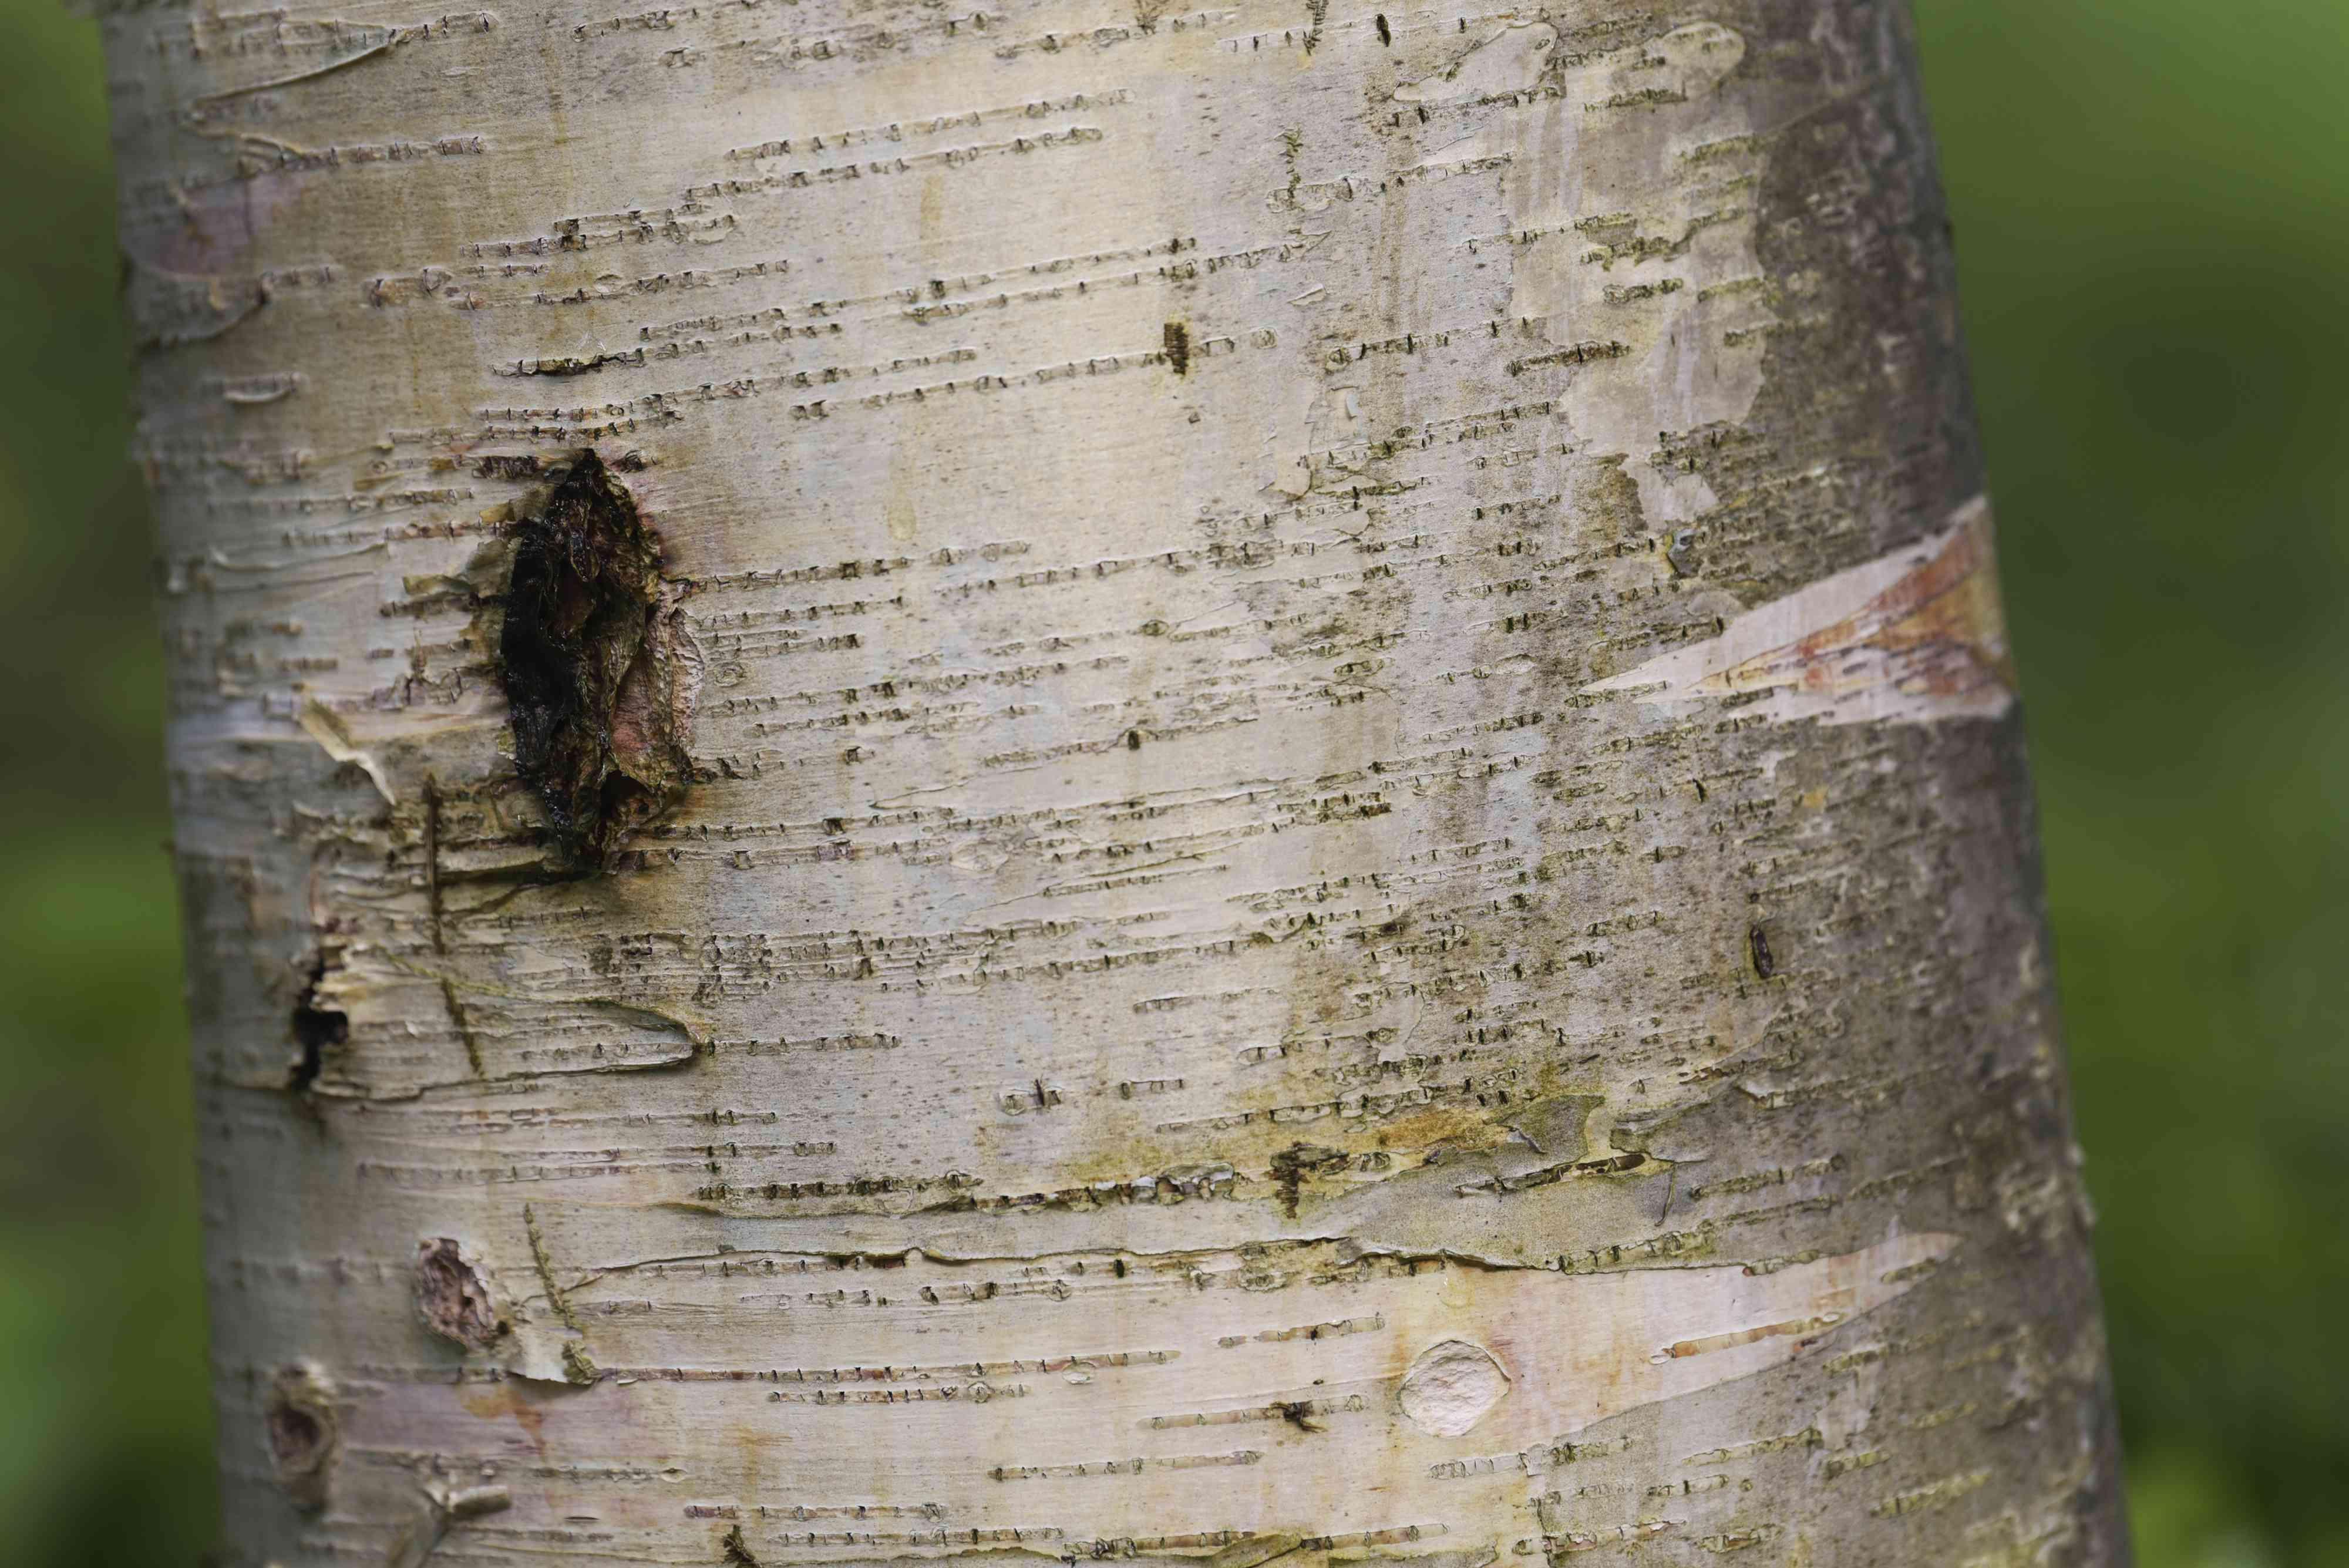 Paper birch tree trunk with peeling white bark closeup